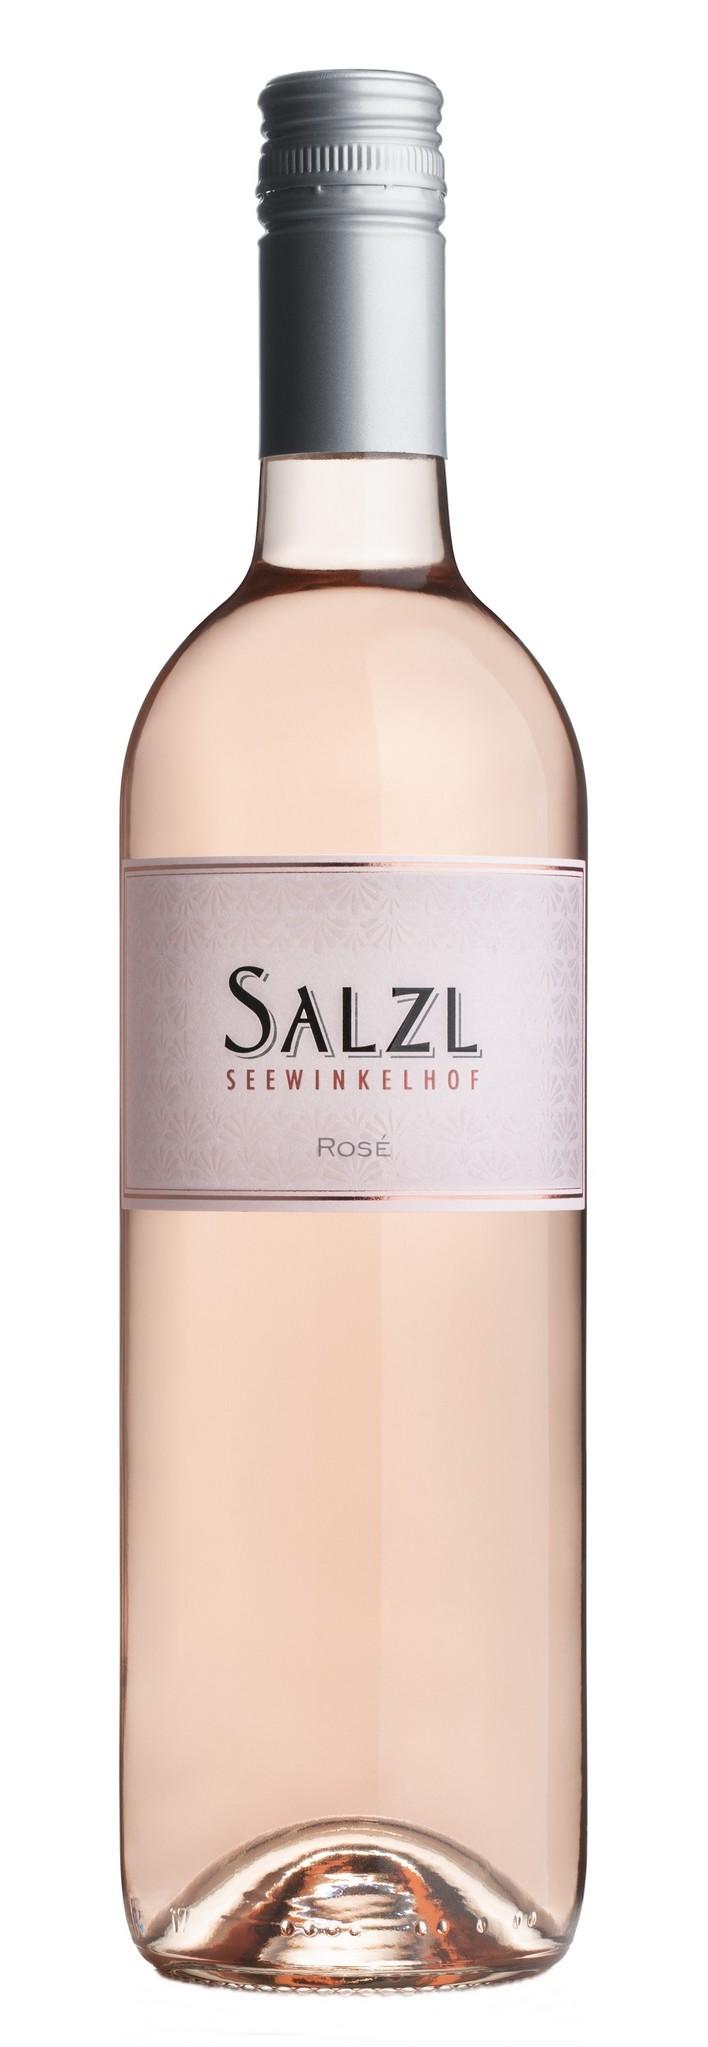 Salzl, Burgenland 2020 Rosé Cuvée trocken, Salzl